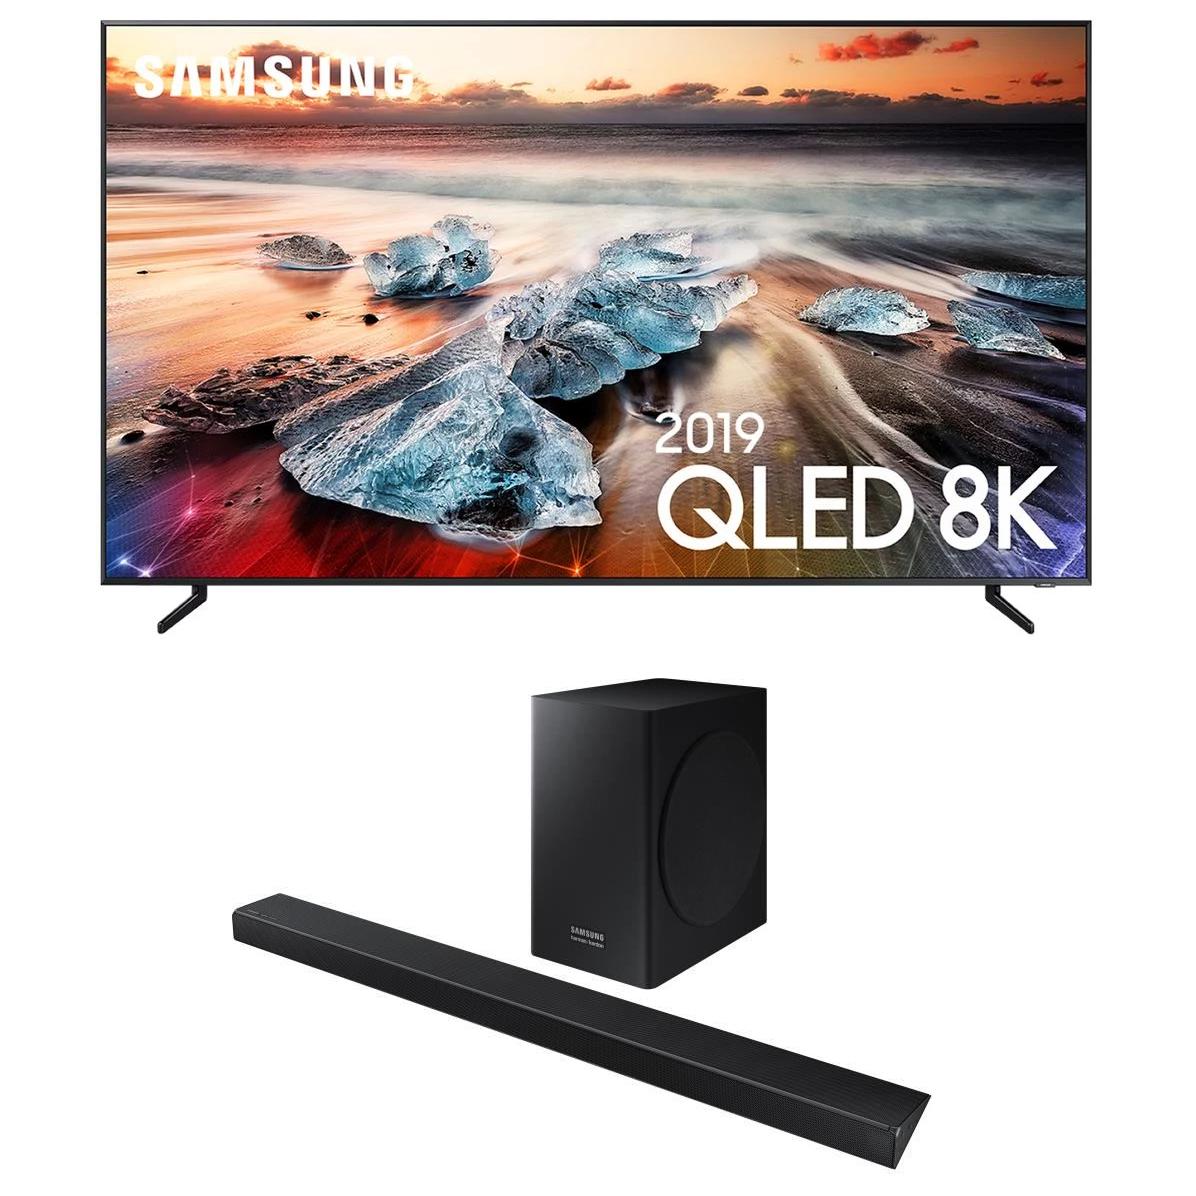 "TV 55"" Samsung QE55Q950R 2019 (QLED, 8K, Q HDR 3000, Dalle 100 Hz, 4300 PQI, Smart TV) + Barre de son HW-Q60R (Via ODR de 1000€ + 200€)"